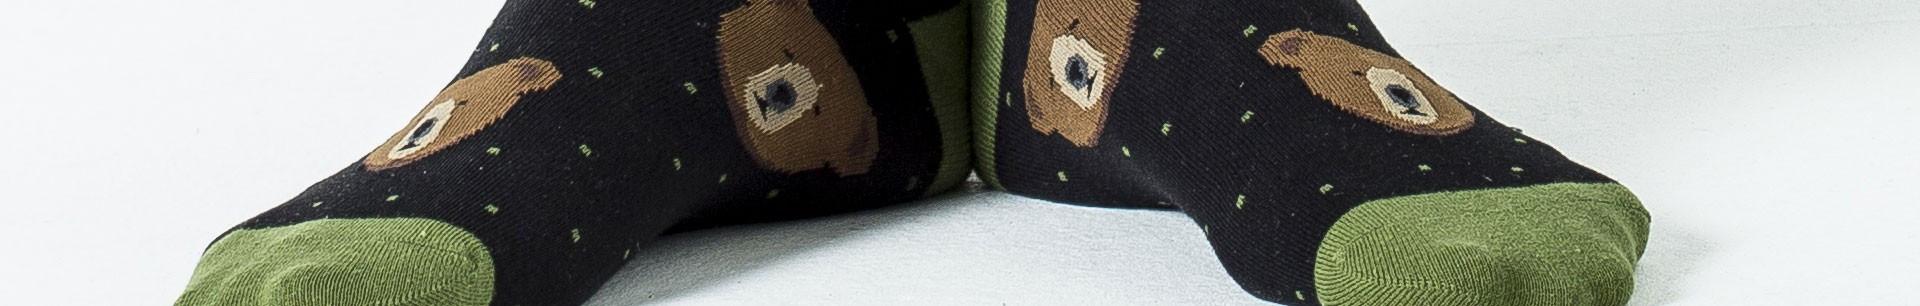 Men's Fashion Socks | Pringle | Glenmuir | Jeff Banks | WildFeet